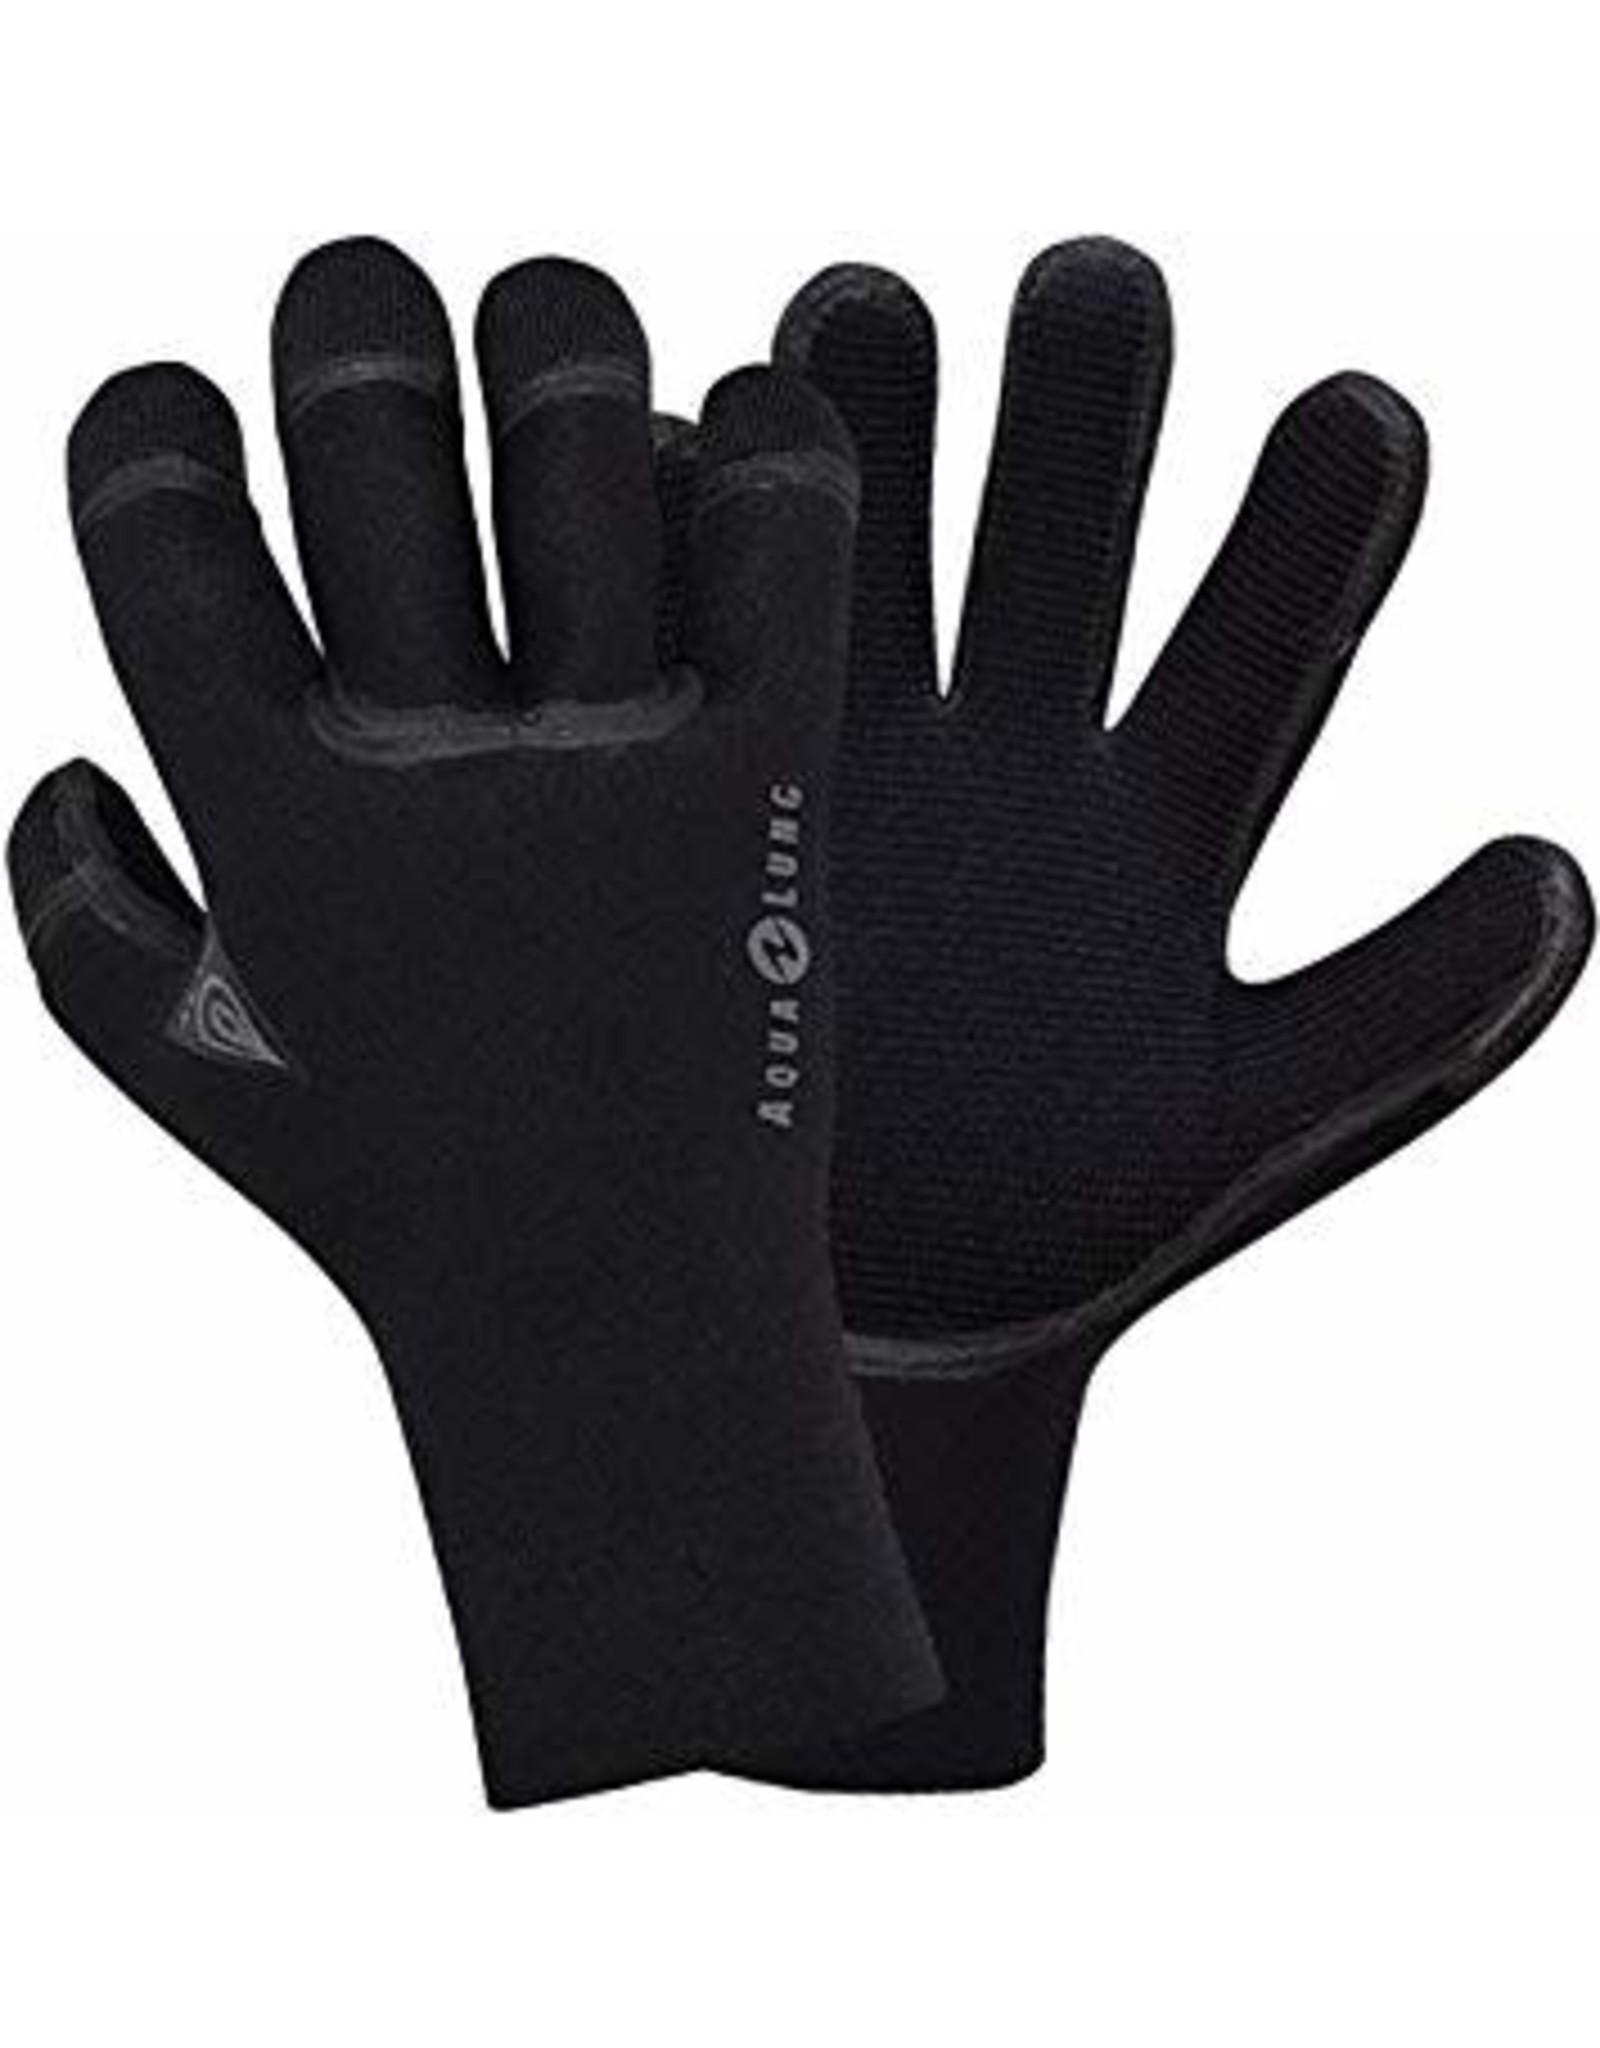 Aqualung Heat Glove